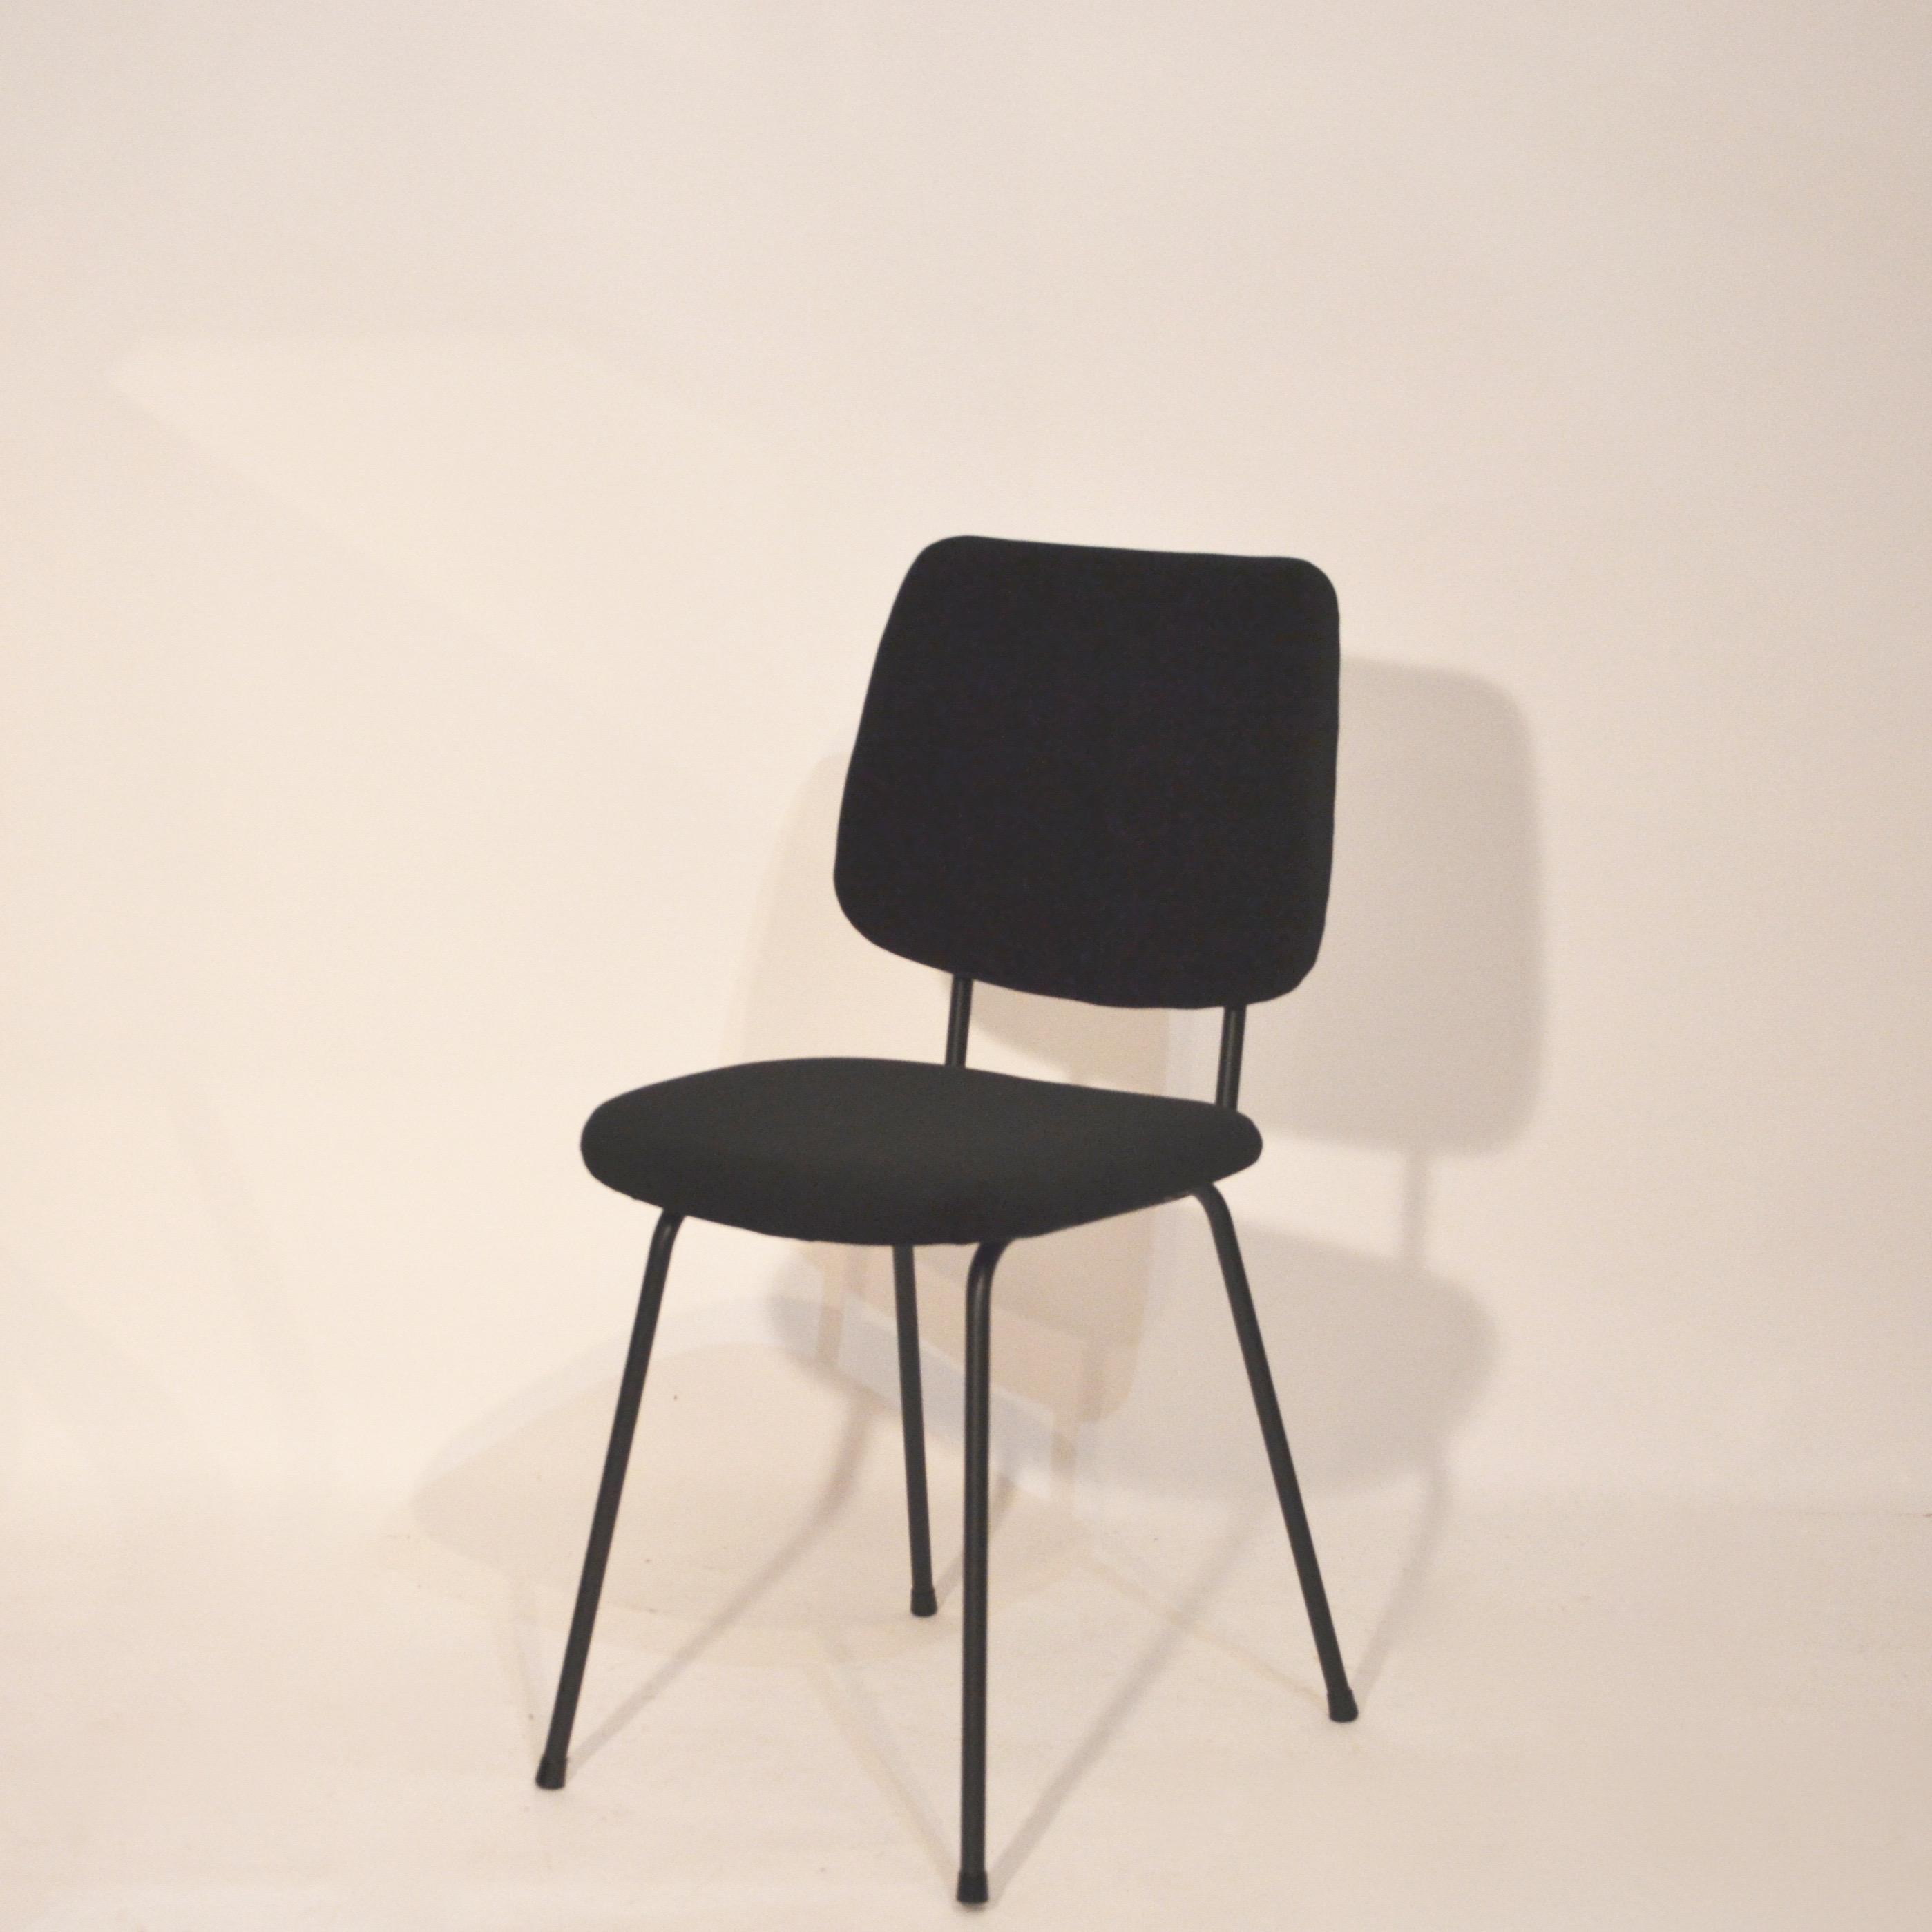 chaise en velours noir bindiesbindies. Black Bedroom Furniture Sets. Home Design Ideas